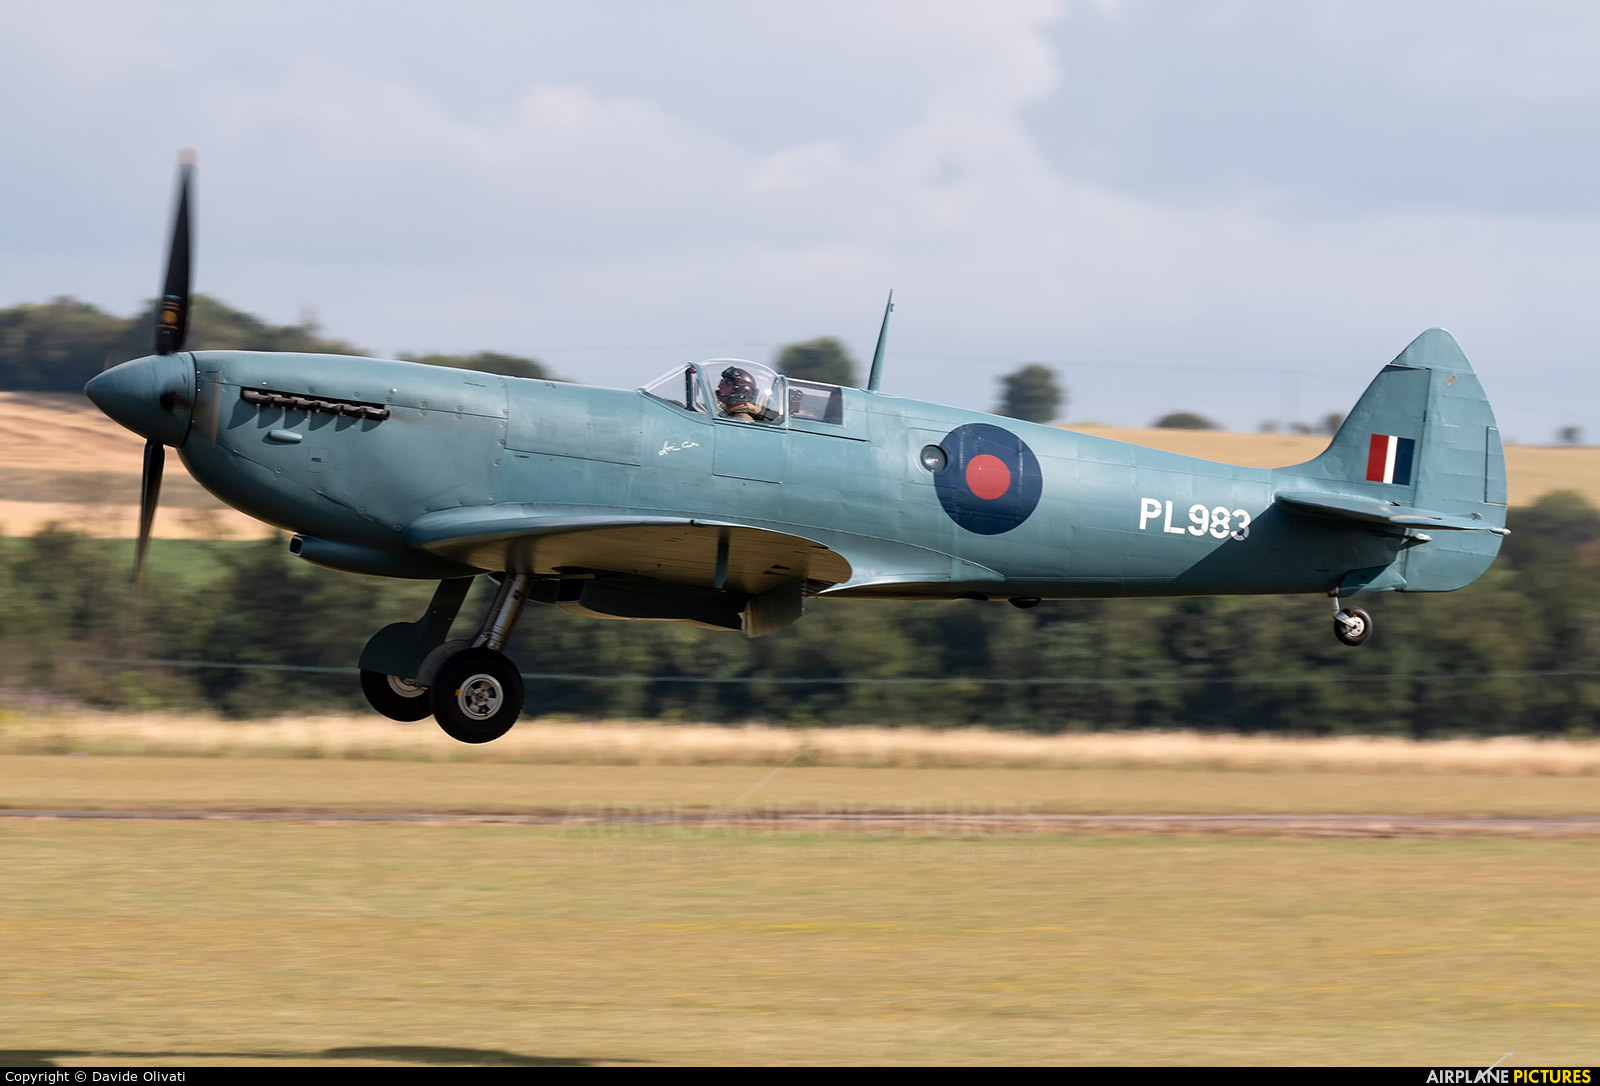 Hangar 11 PL965 aircraft at Duxford